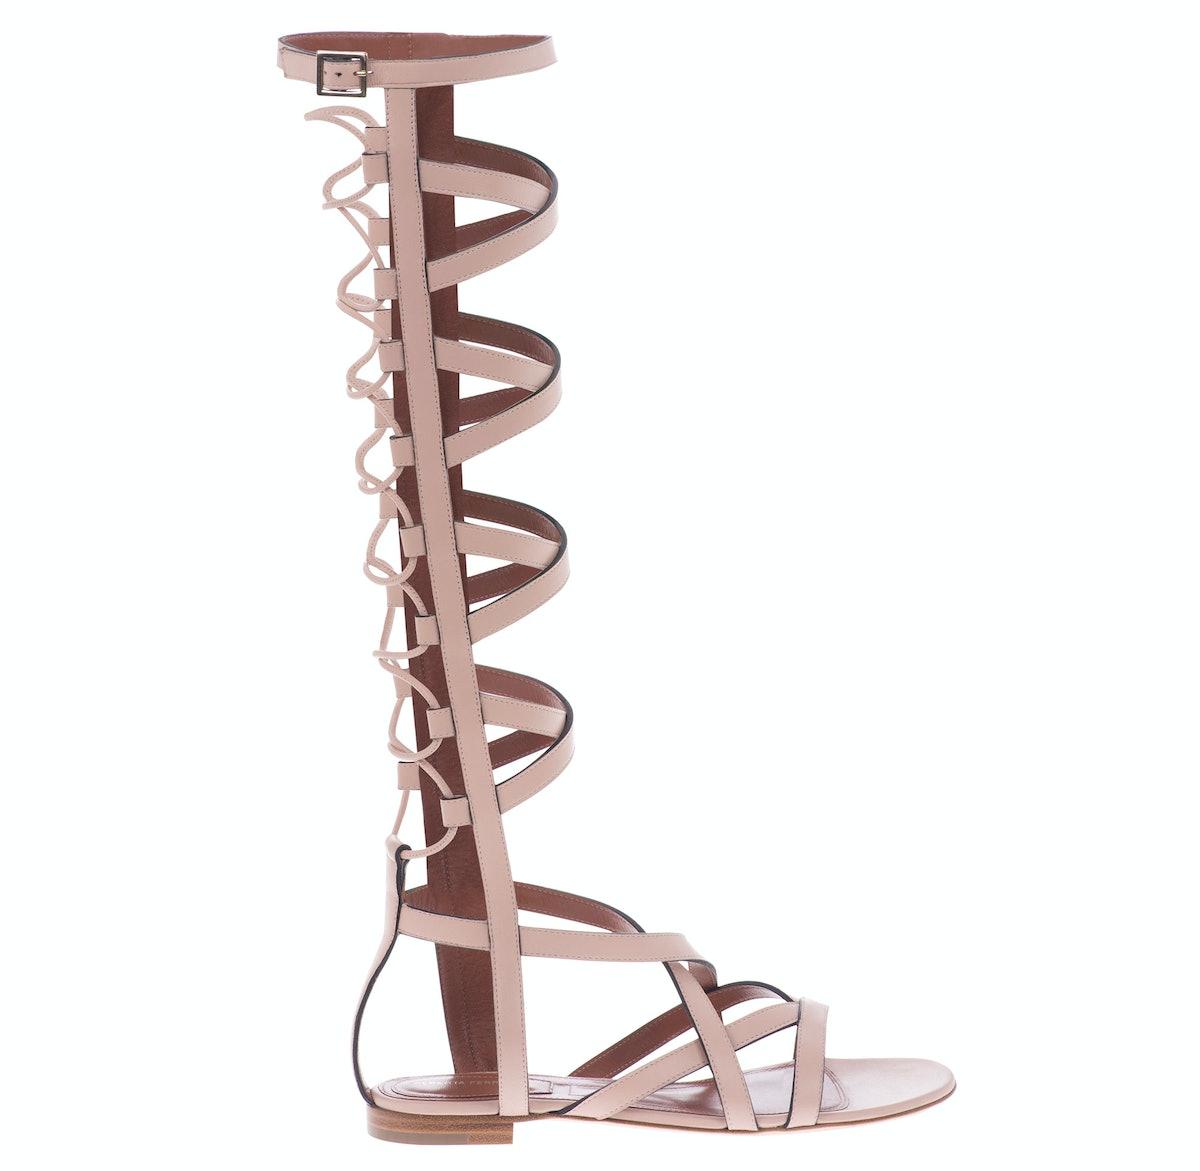 Alberta Ferretti gladiator sandals